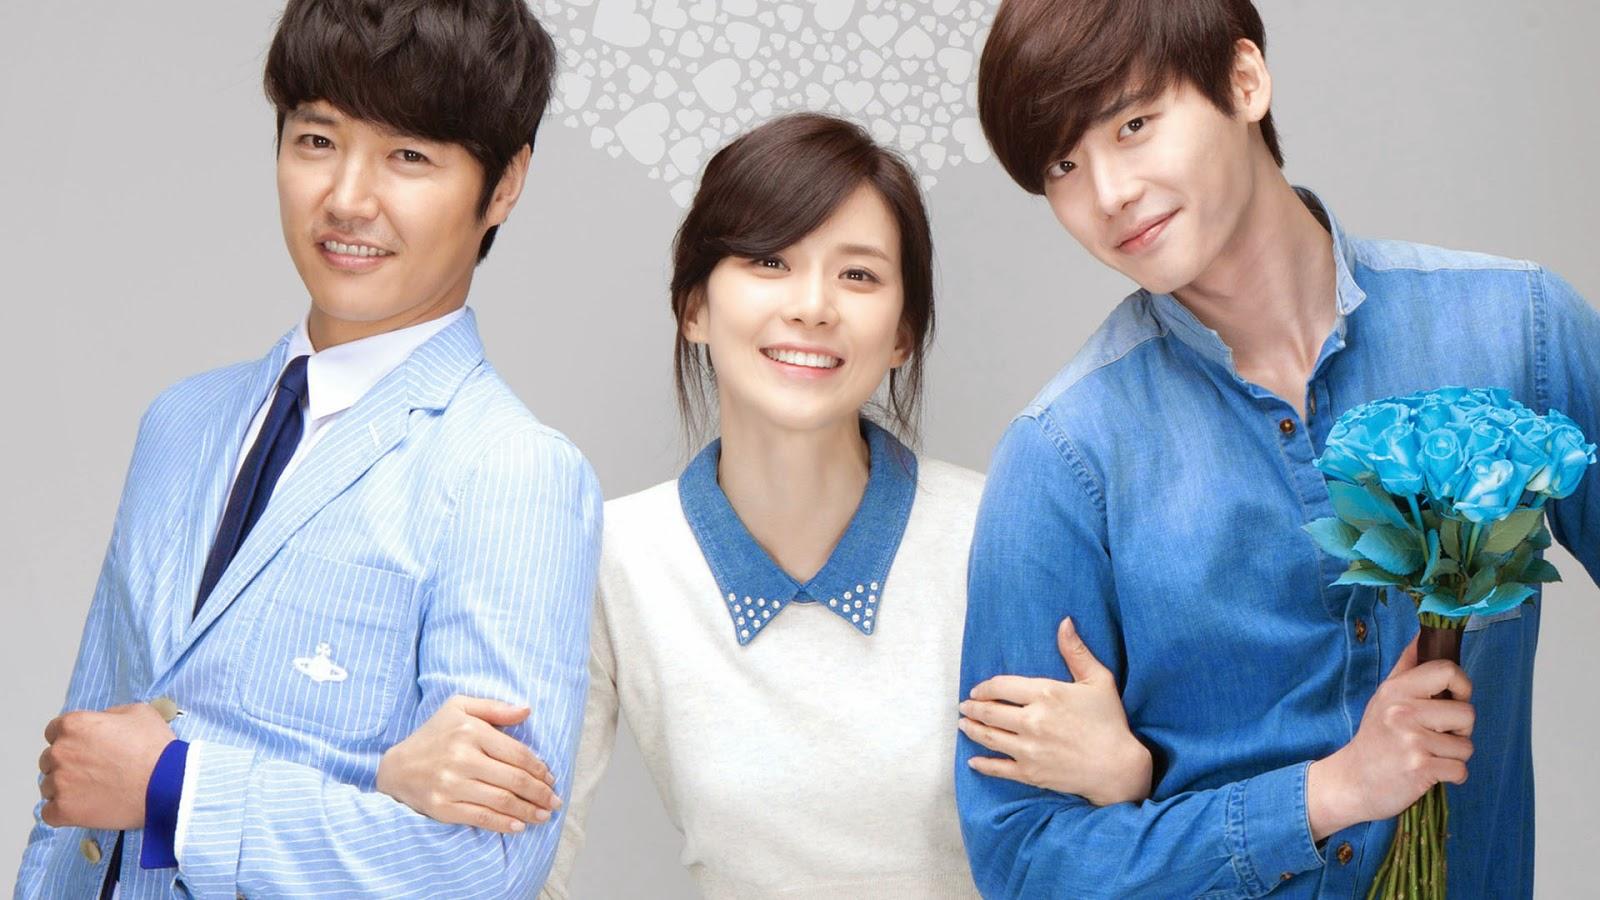 I-hear-your-voice-korean-dramas-35264405-1920-1080.jpg